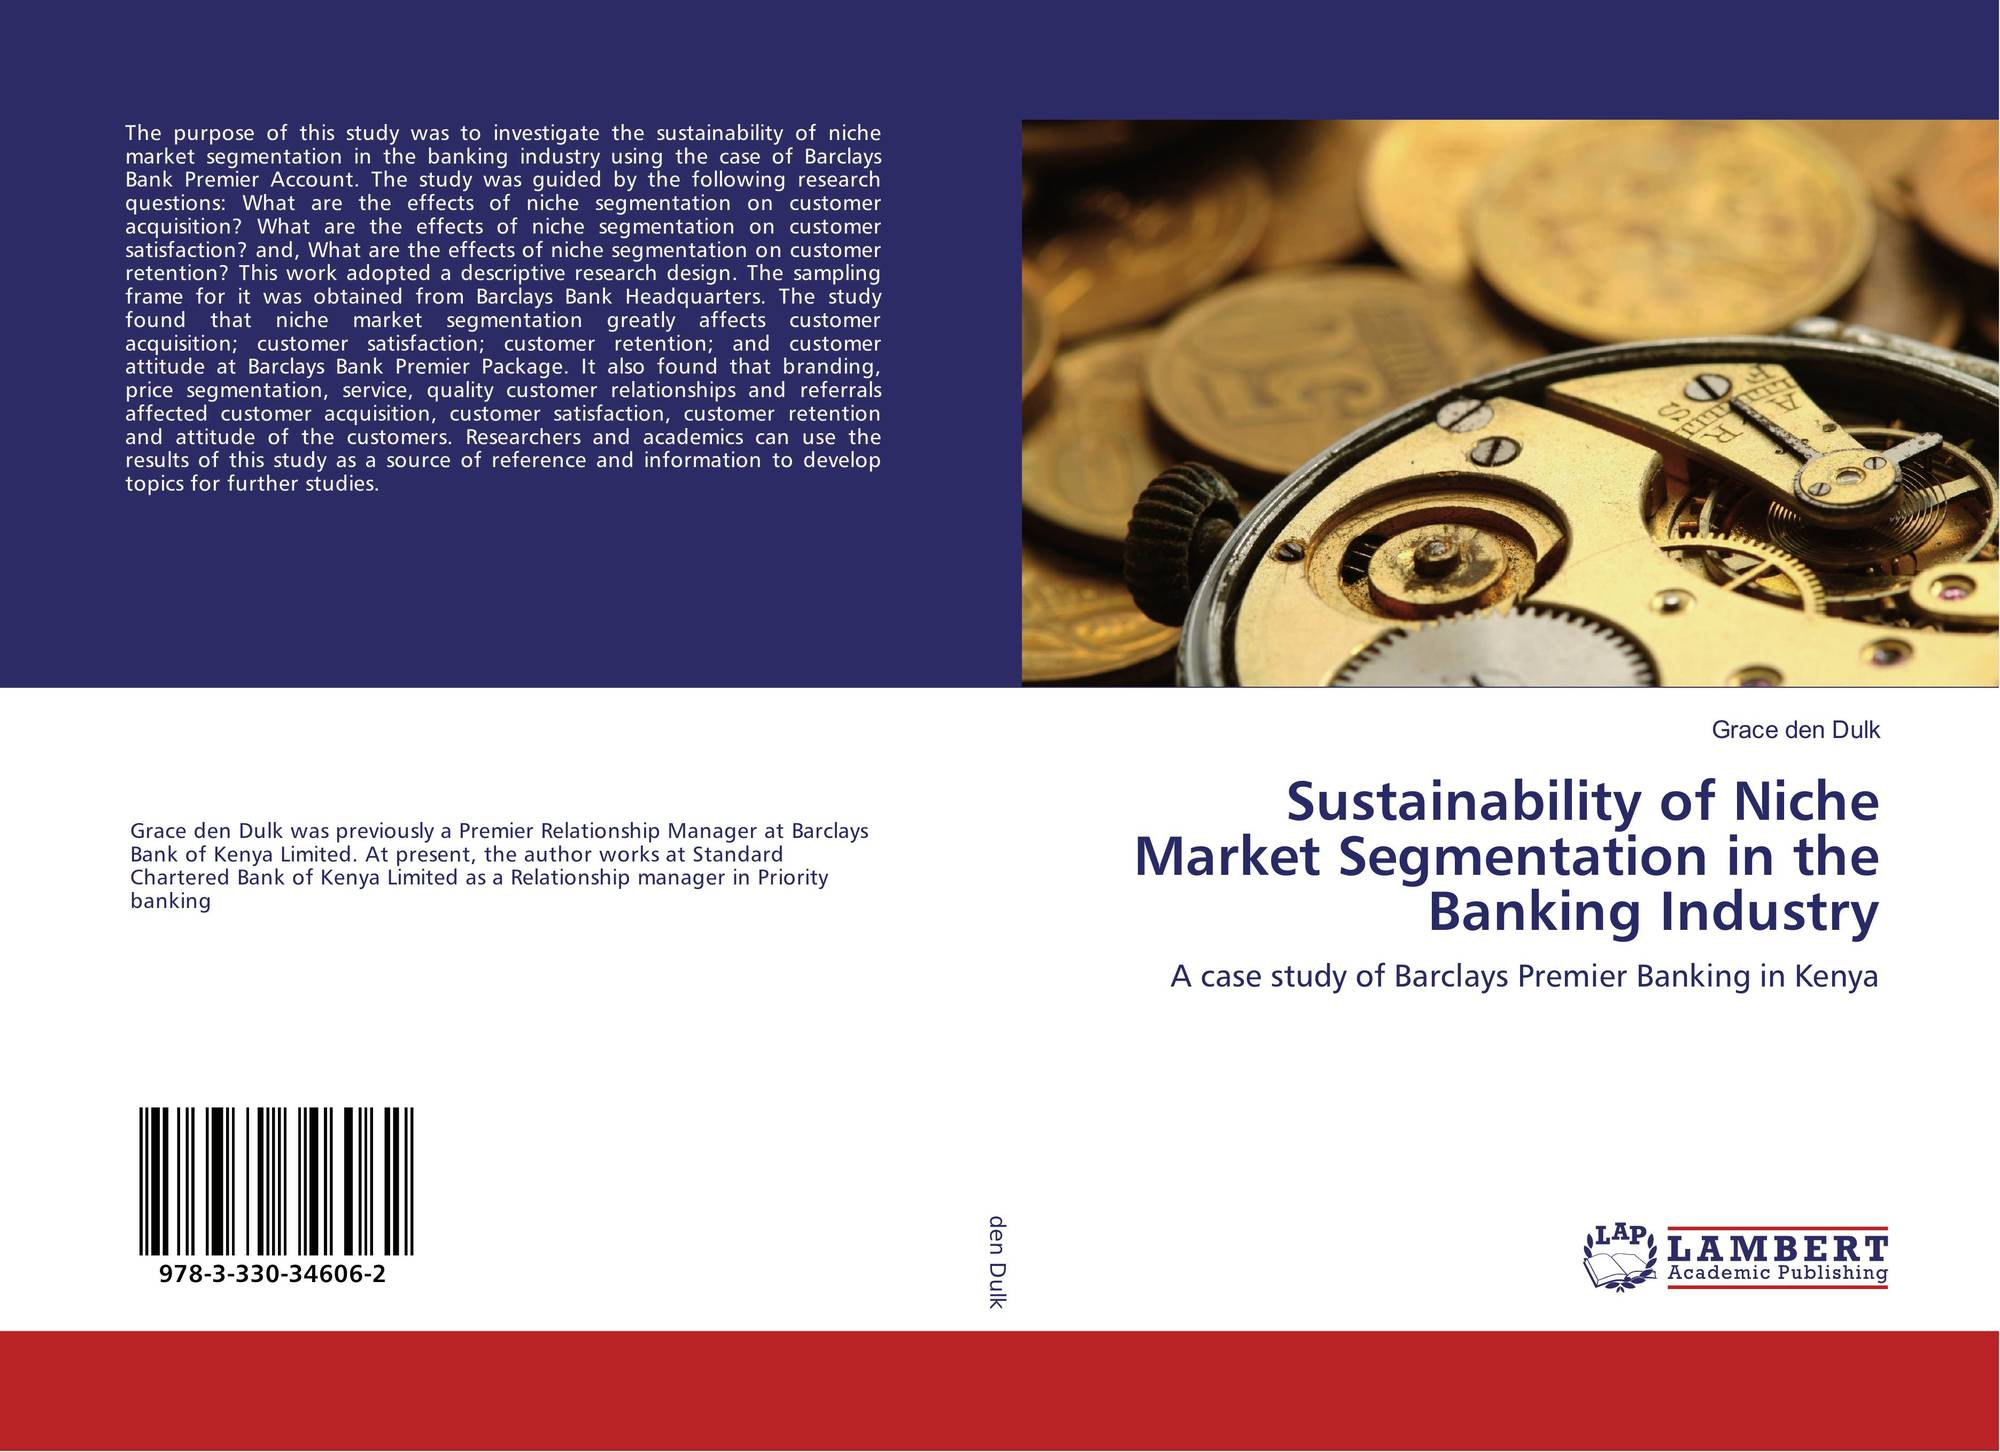 market segmentation in banking industry Market segmentation in banking sector - download as word doc (doc), pdf  file (pdf), text file (txt) or read online.